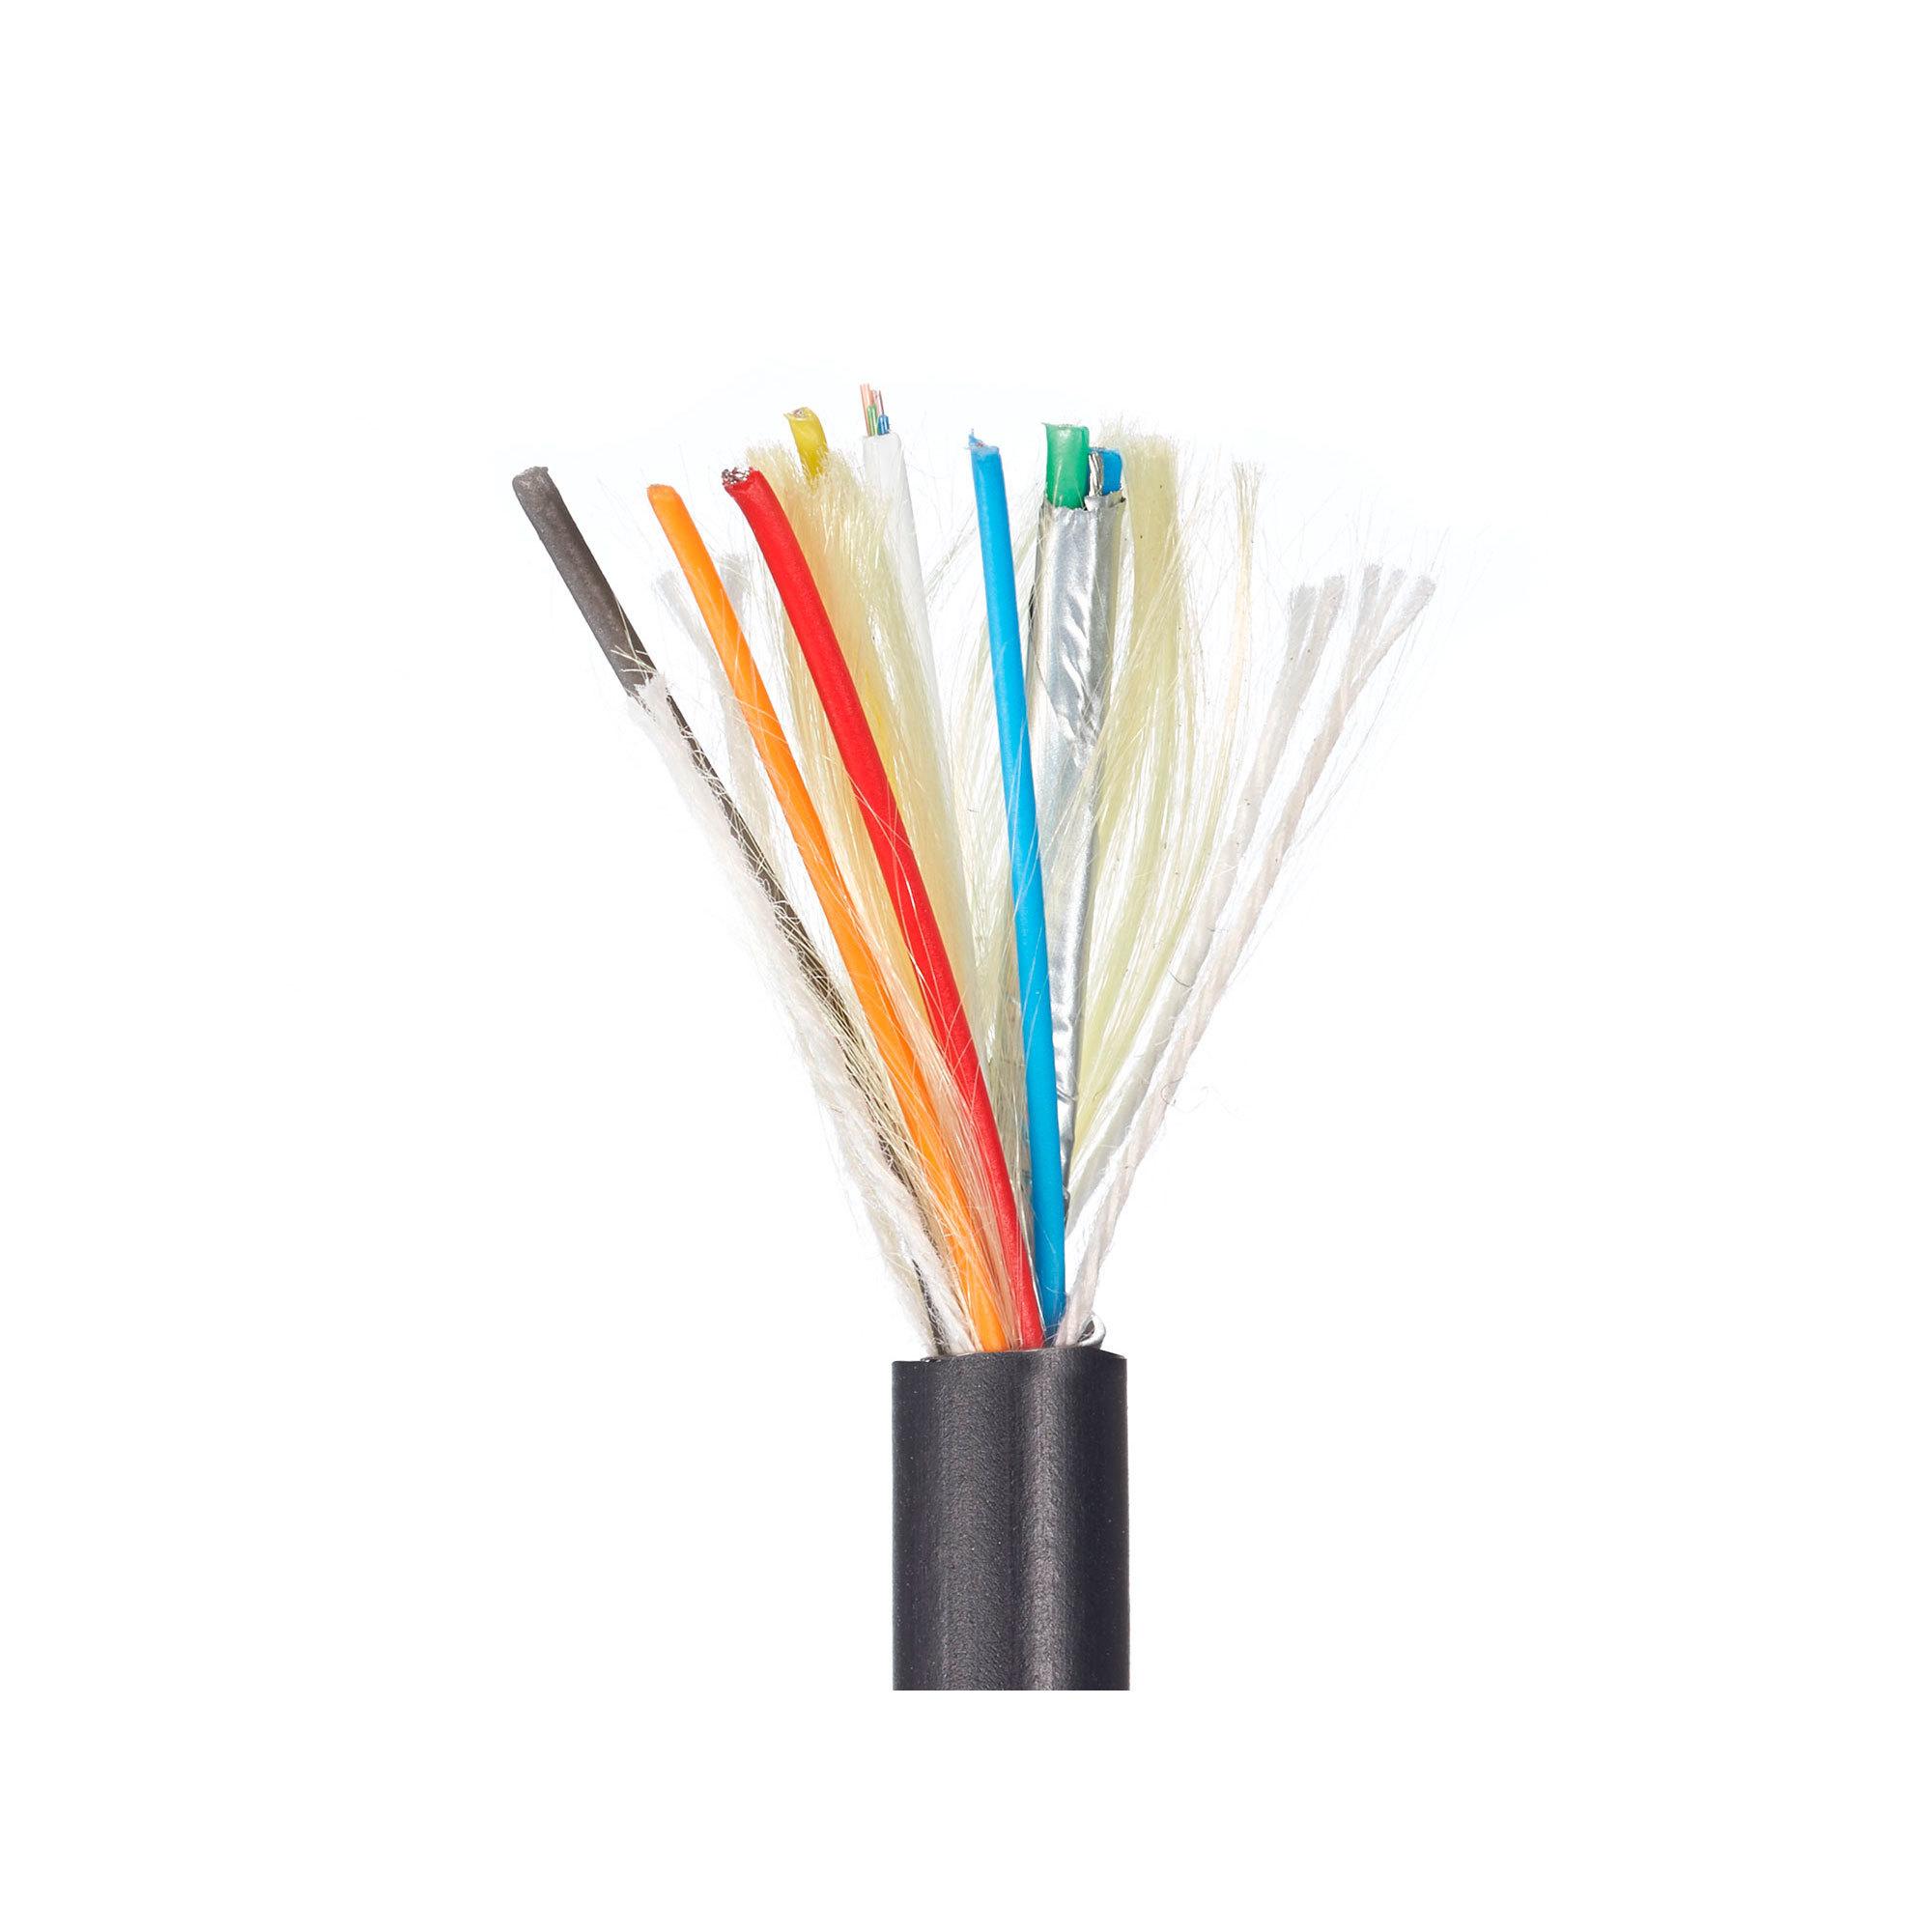 Inakustik Profi HDMI 2.1 optical fiber cable 8K 48Gbps